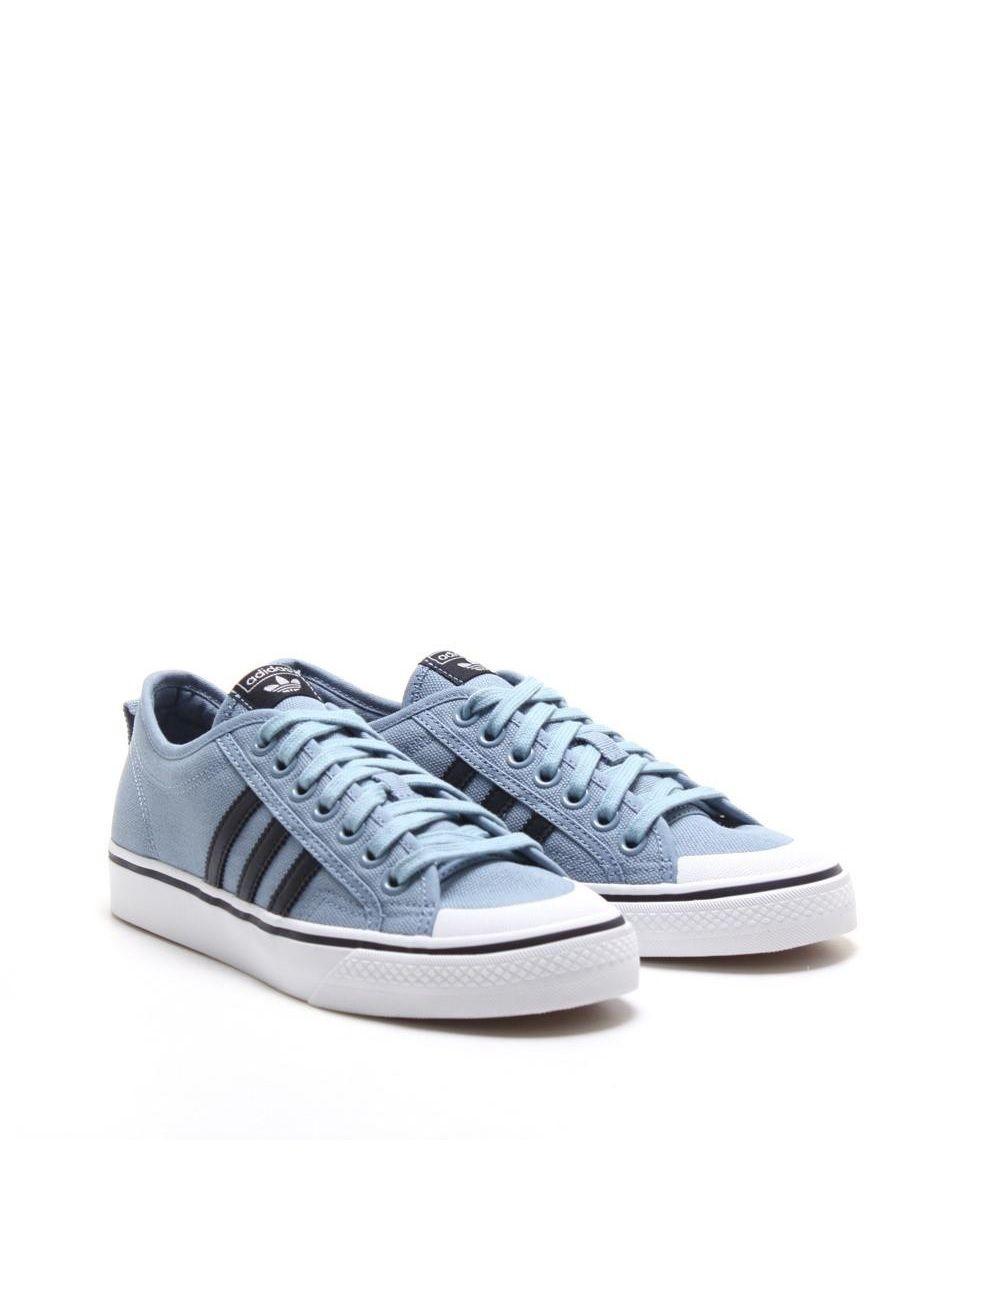 adidas originali nizza basso: tattile blu zapatos pinterest adidas